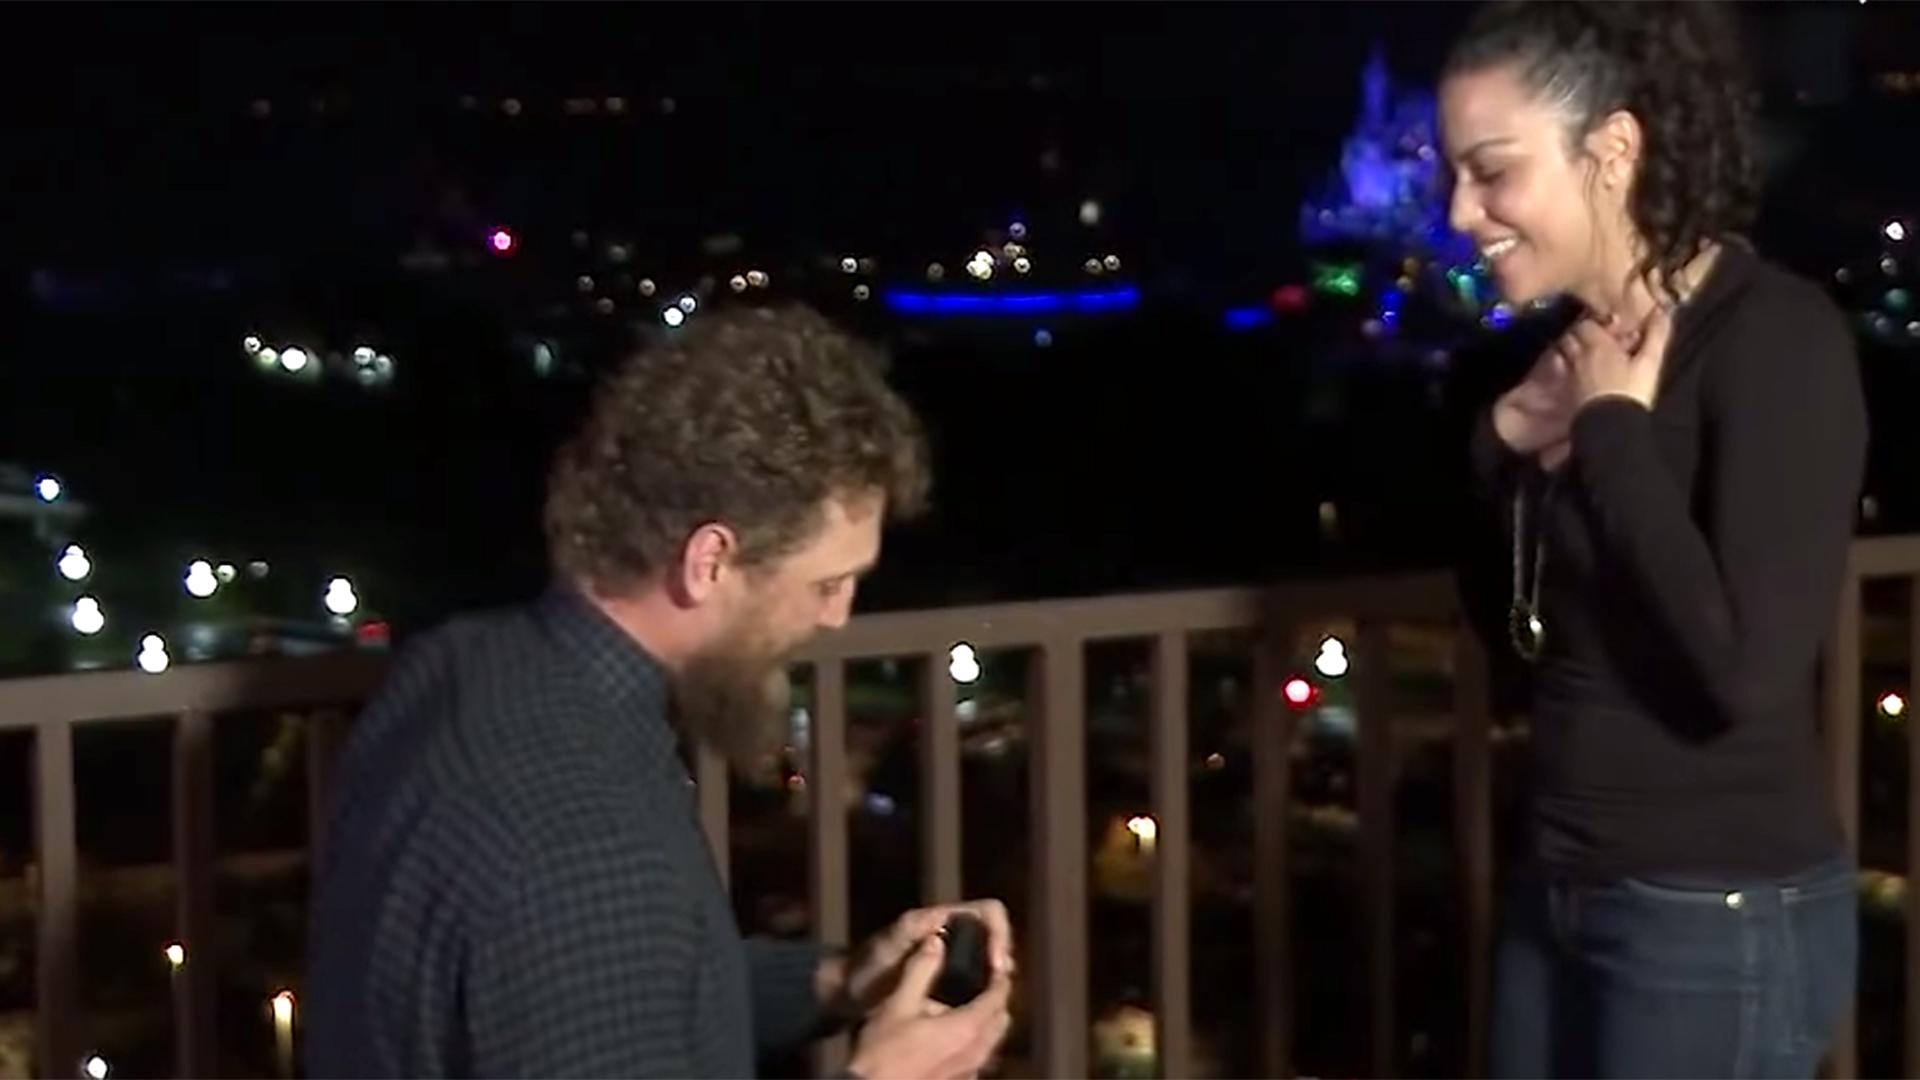 Mlb Star Hunter Pence Pulls Off Magical Wedding Proposal At Disney World